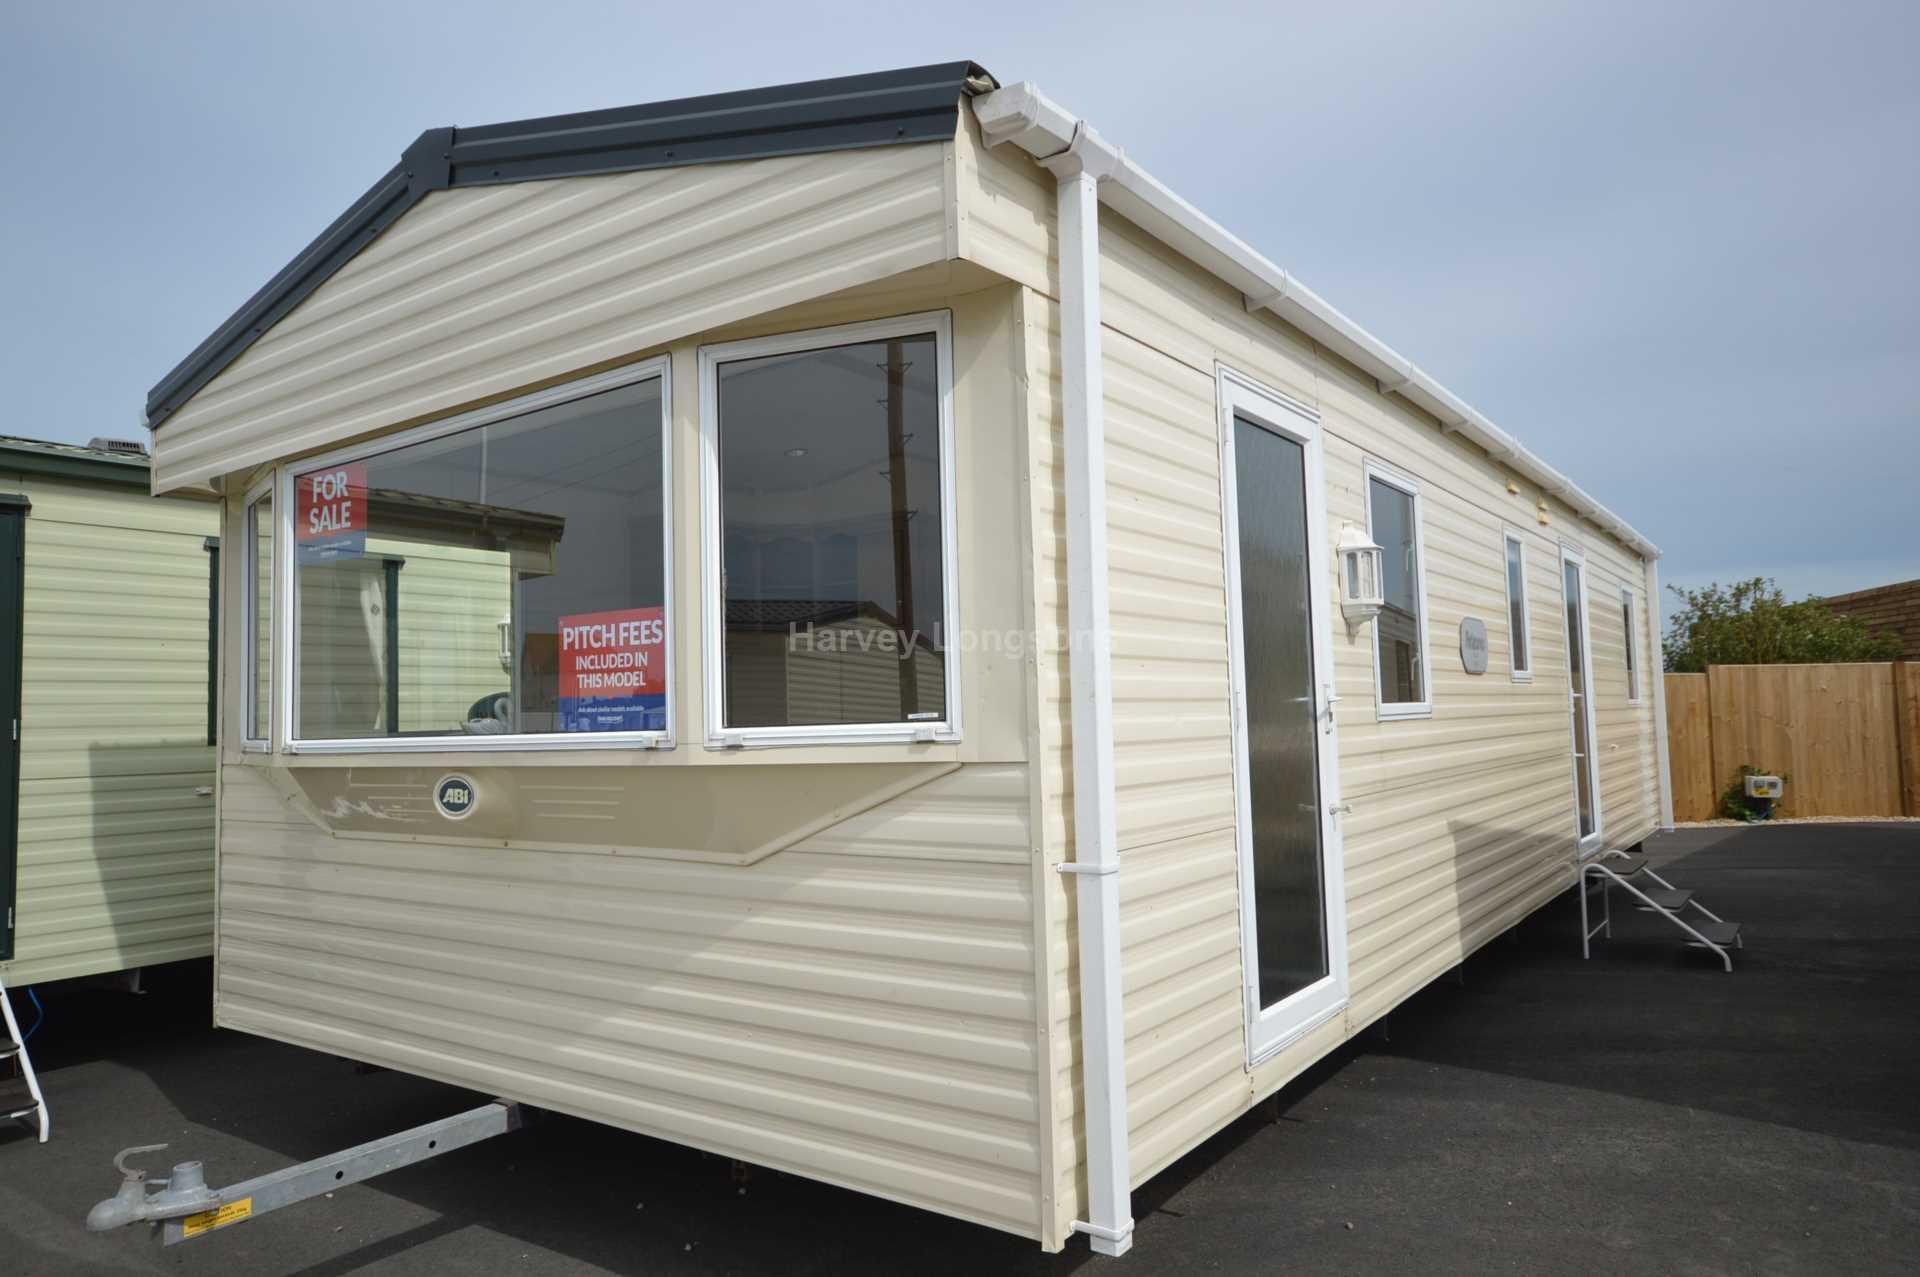 Fantastic  Luxury Caravan For SALE Near Leysdown Kent  Campervans Amp Caravans